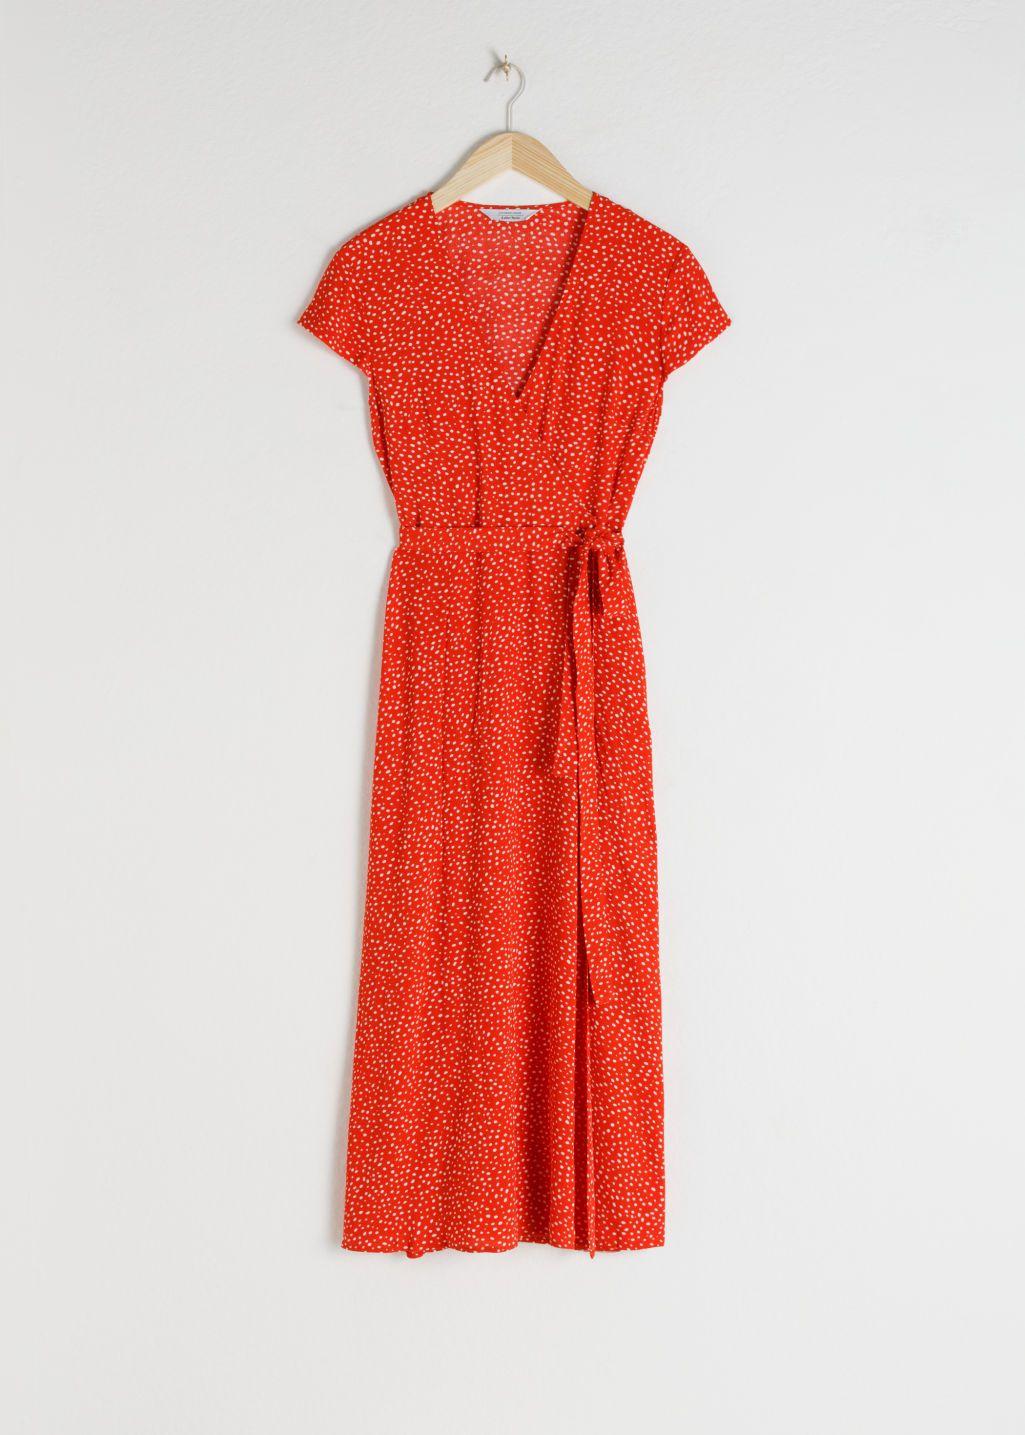 ed49a7f1d0e4 Polka Dot Midi Wrap Dress in 2019 | • outfits • | Pink midi dress ...